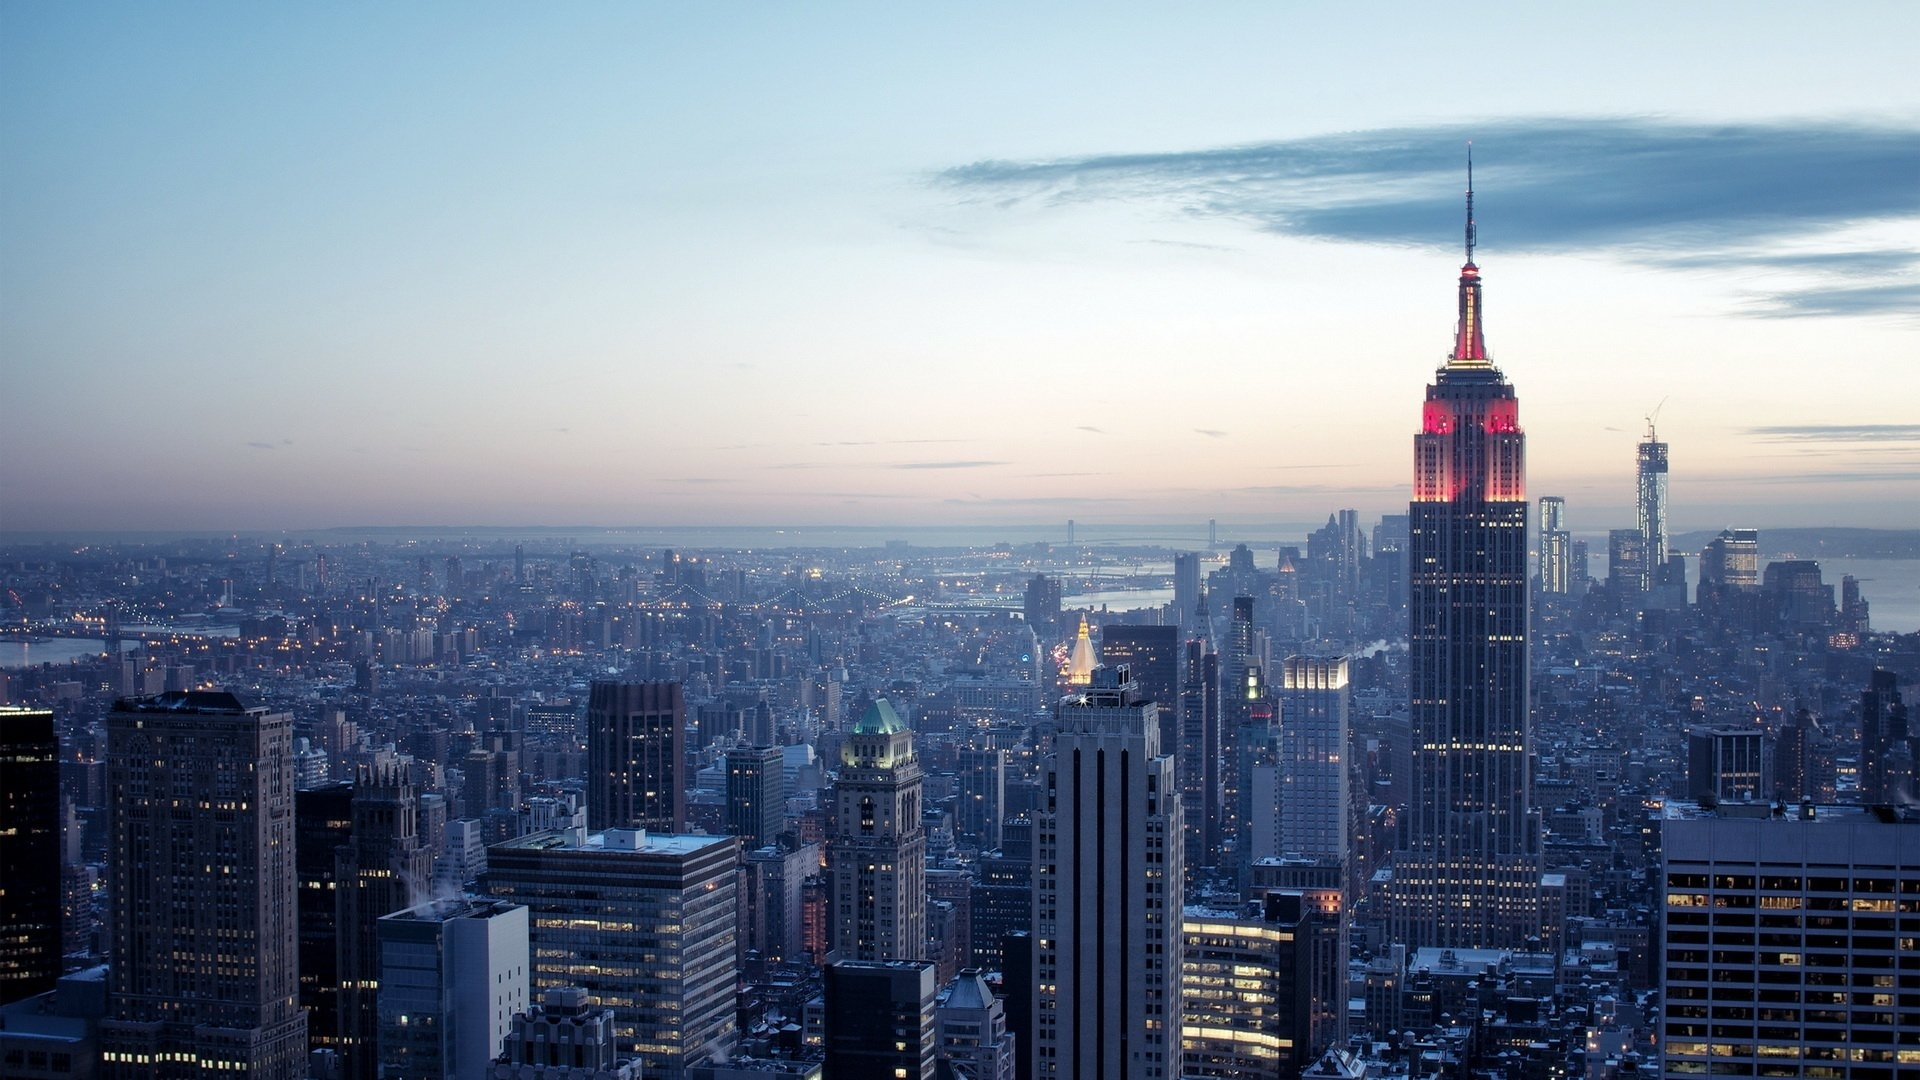 new york full hd fond d'écran and arrière-plan | 1920x1080 | id:439361